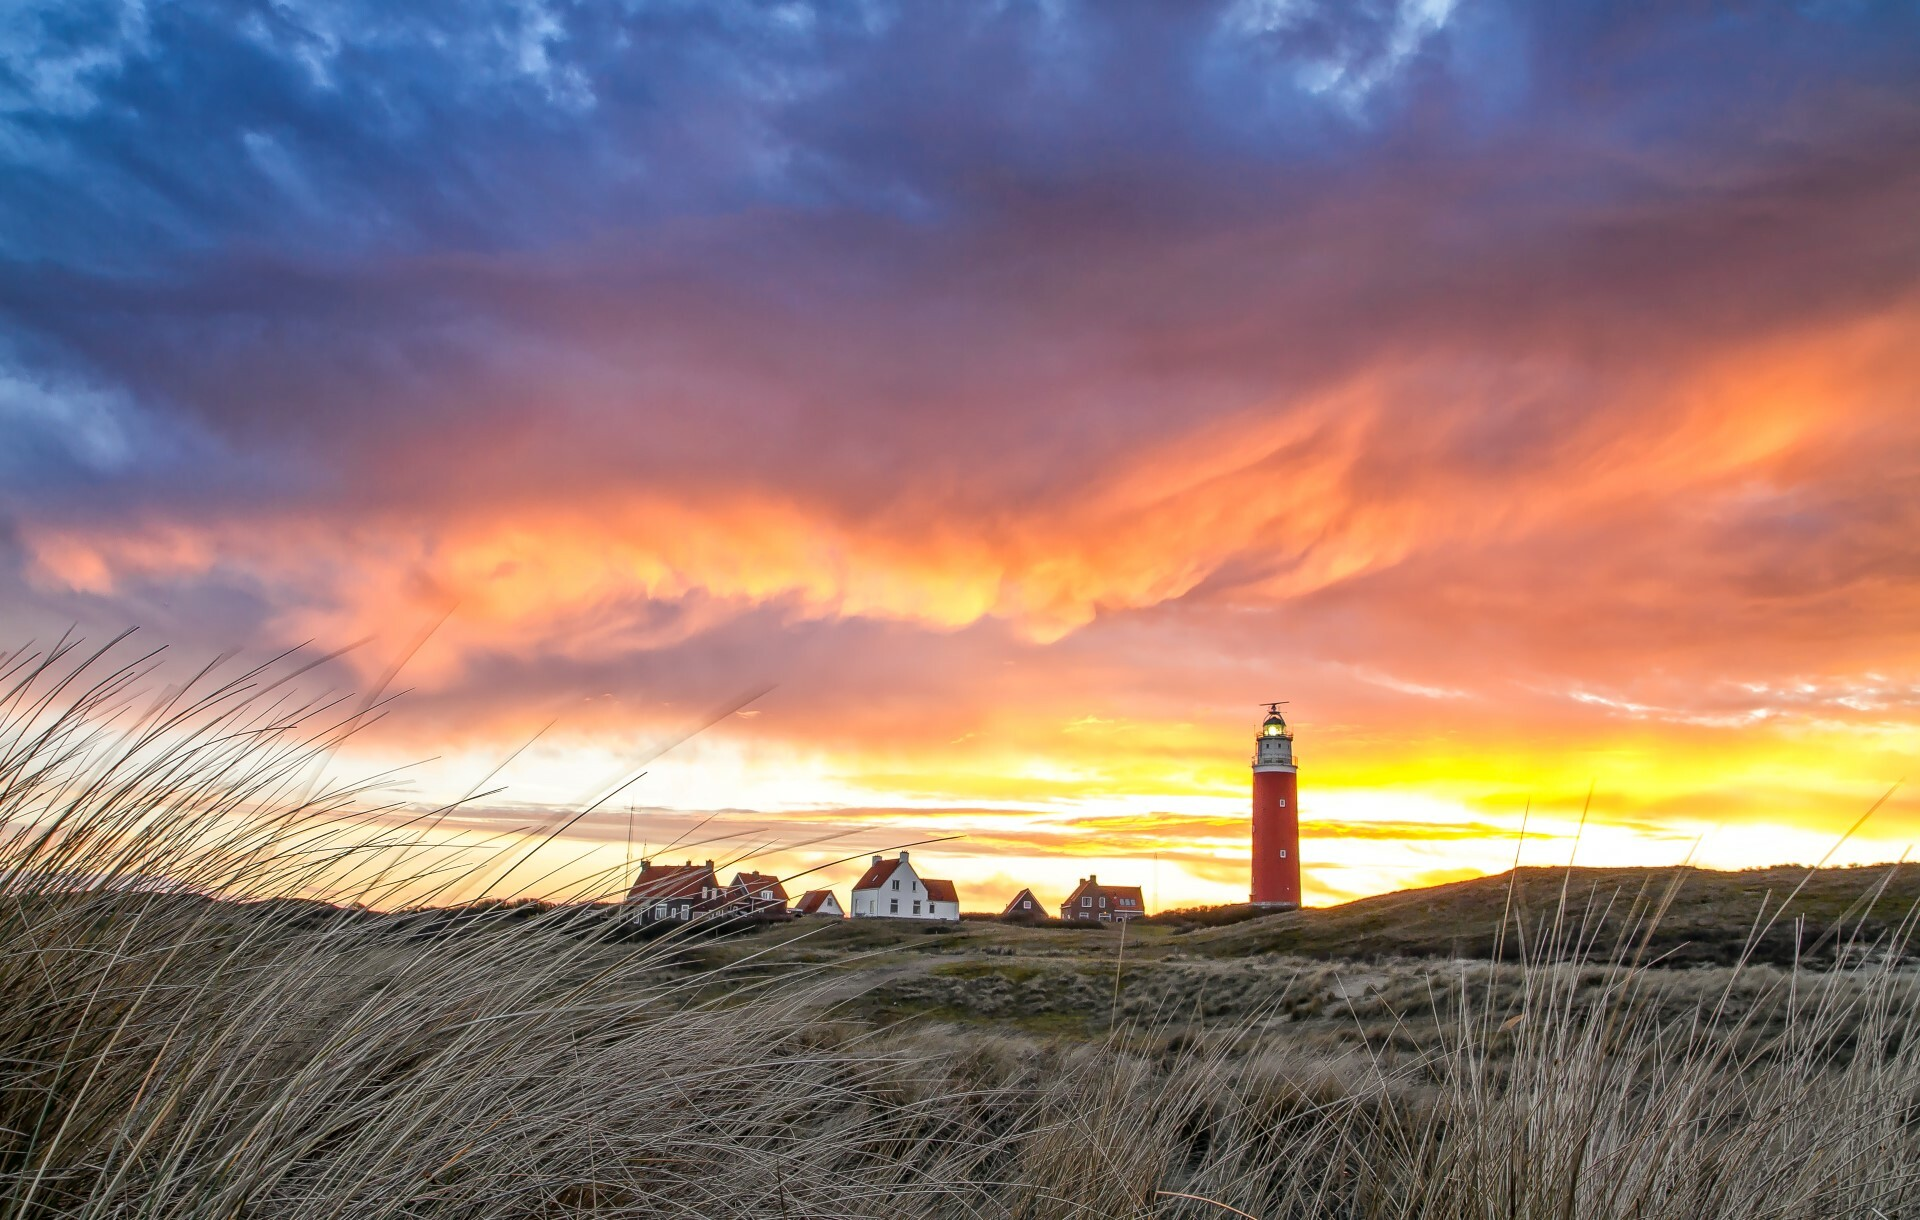 Vuurtoren met spannende wolkenluchten VVV Texel fotograaf Justin Sinner